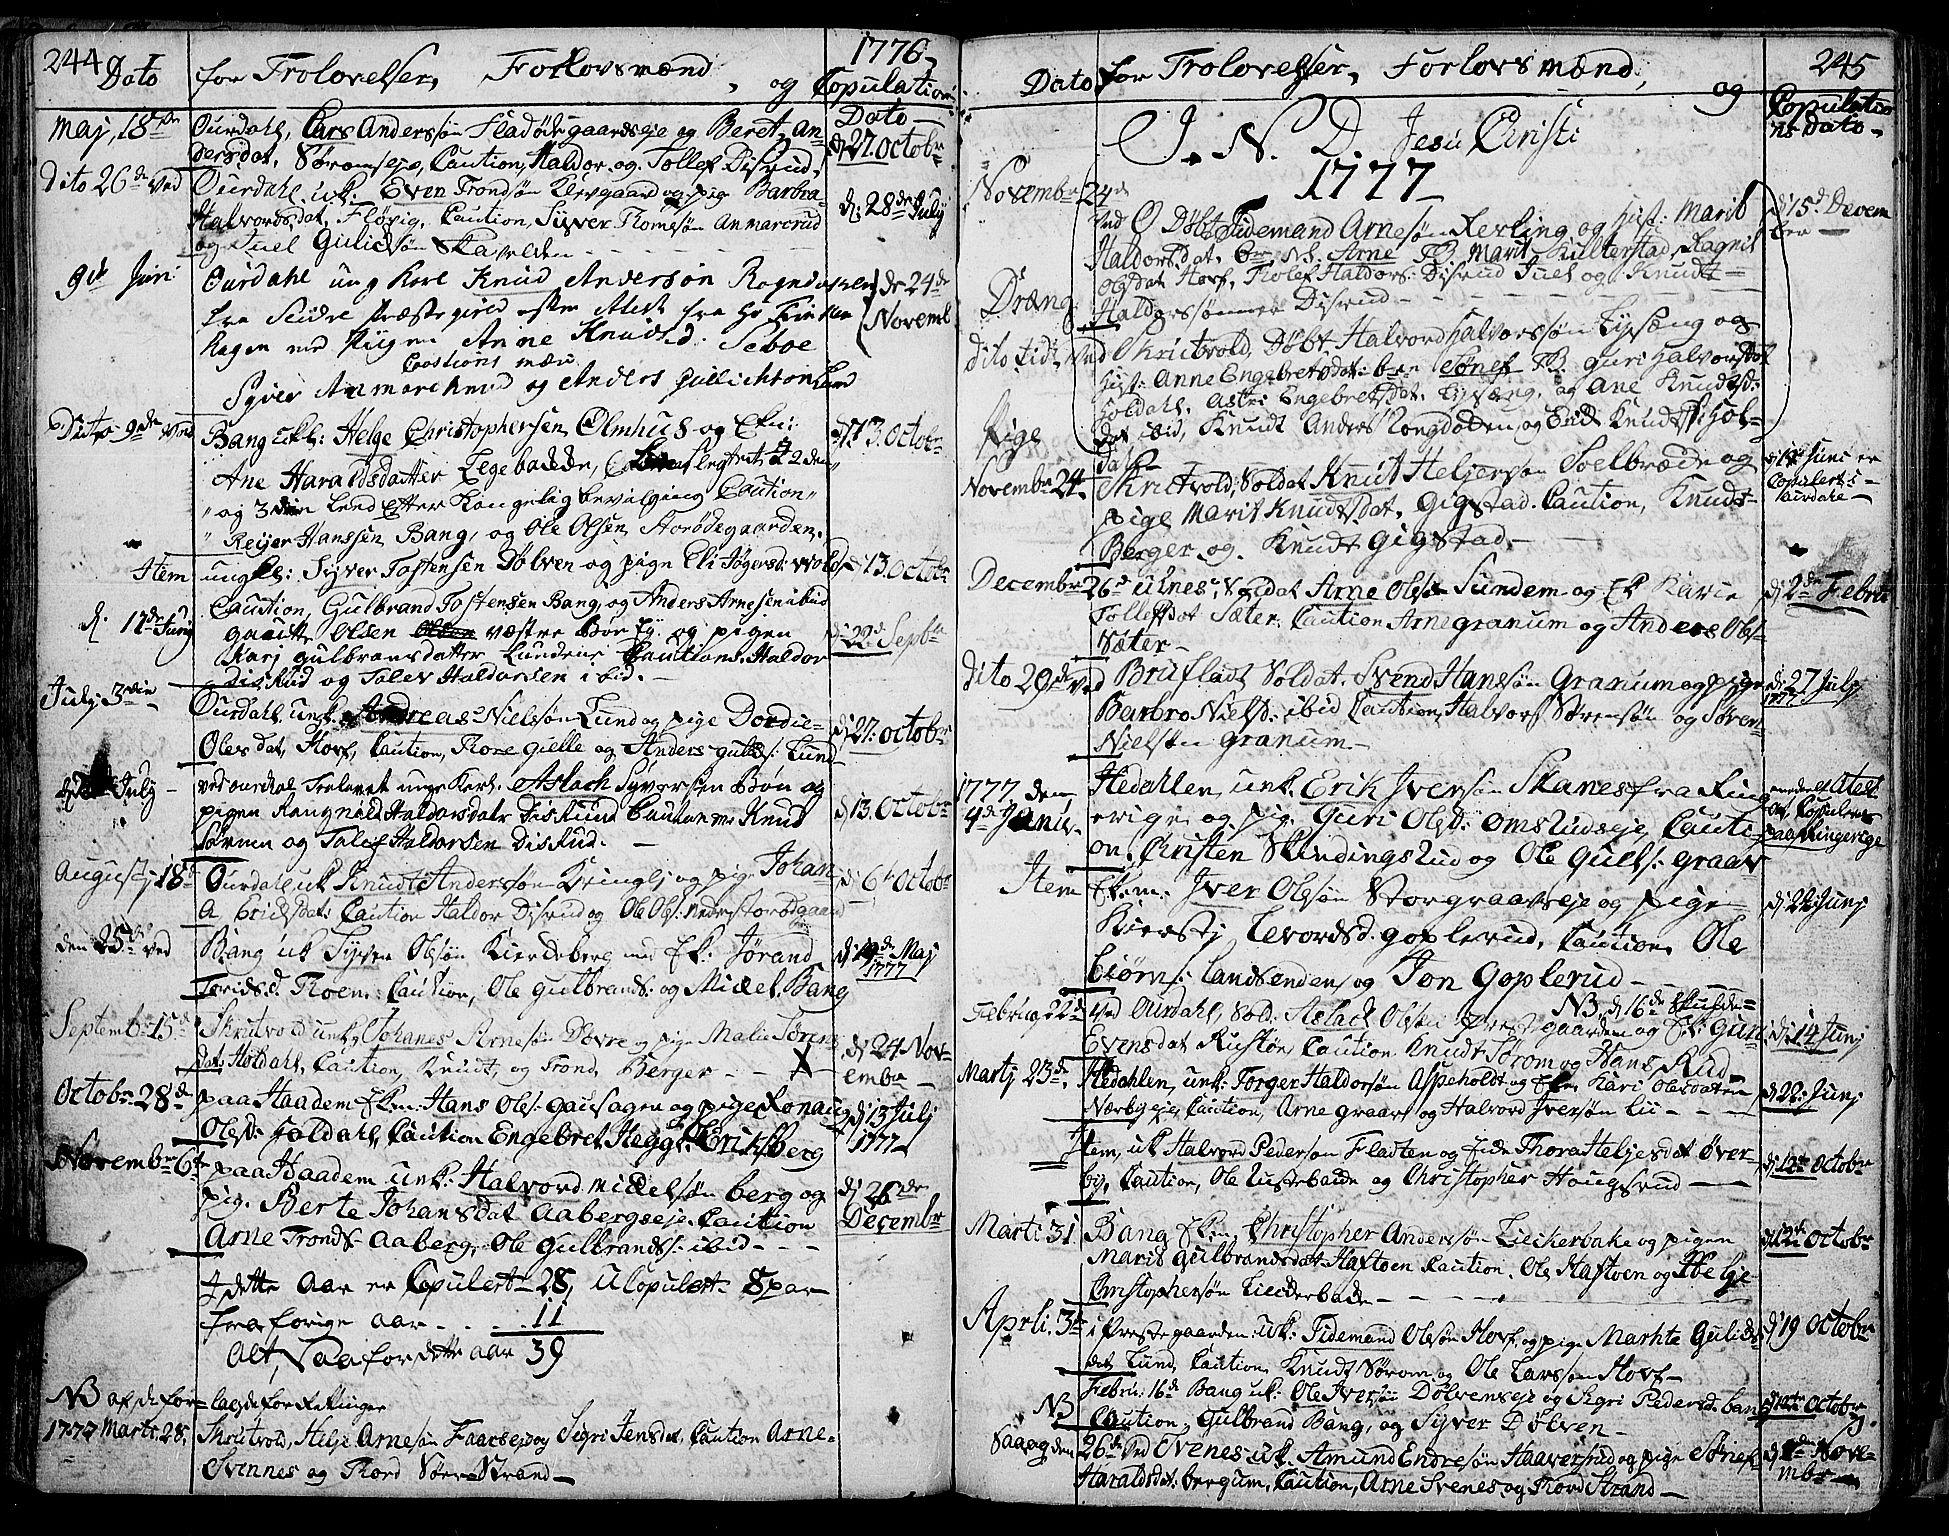 SAH, Aurdal prestekontor, Ministerialbok nr. 5, 1763-1781, s. 244-245